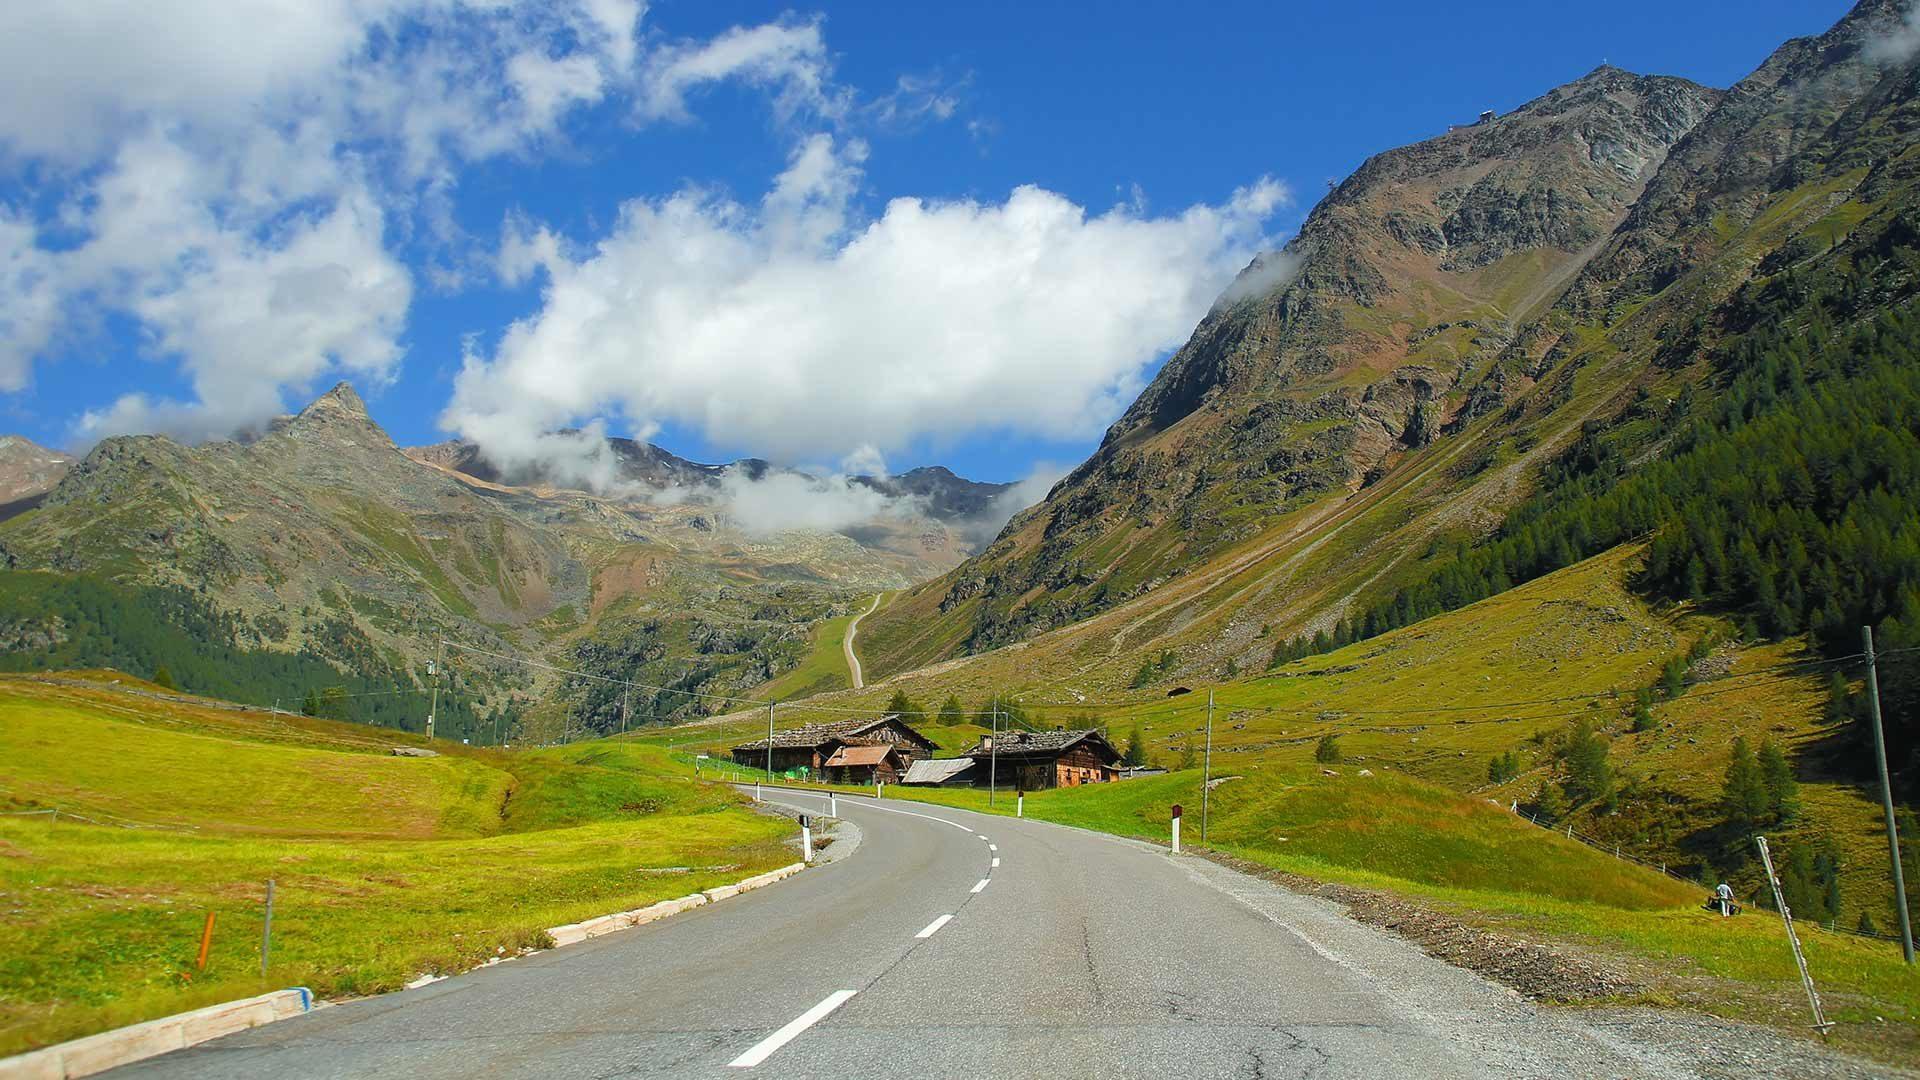 Val Senales in Alto Adige